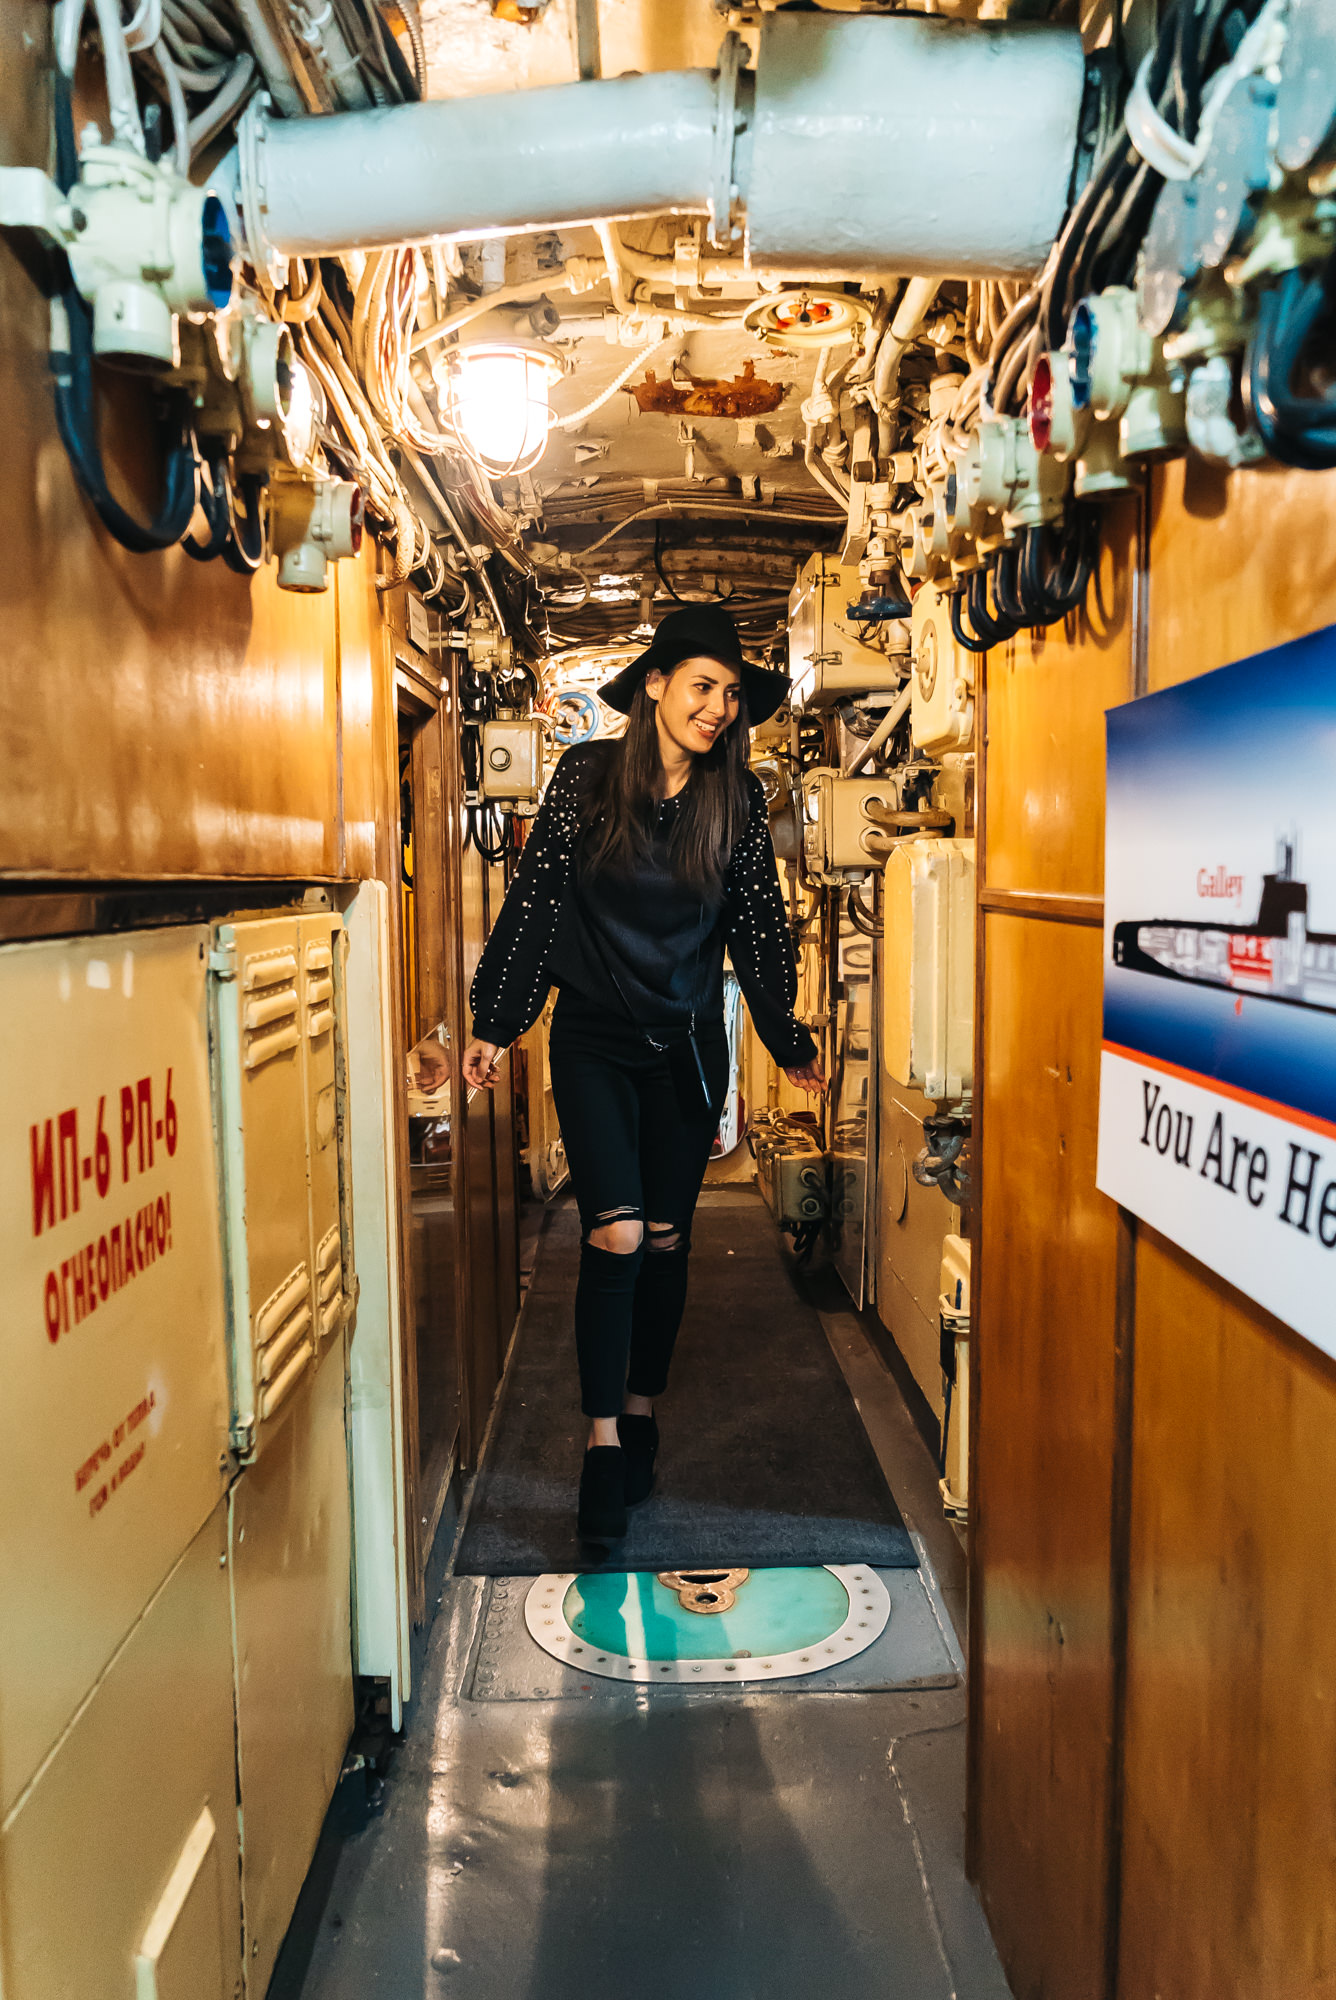 Walking through the narrow hallway of the B-39 Submarine